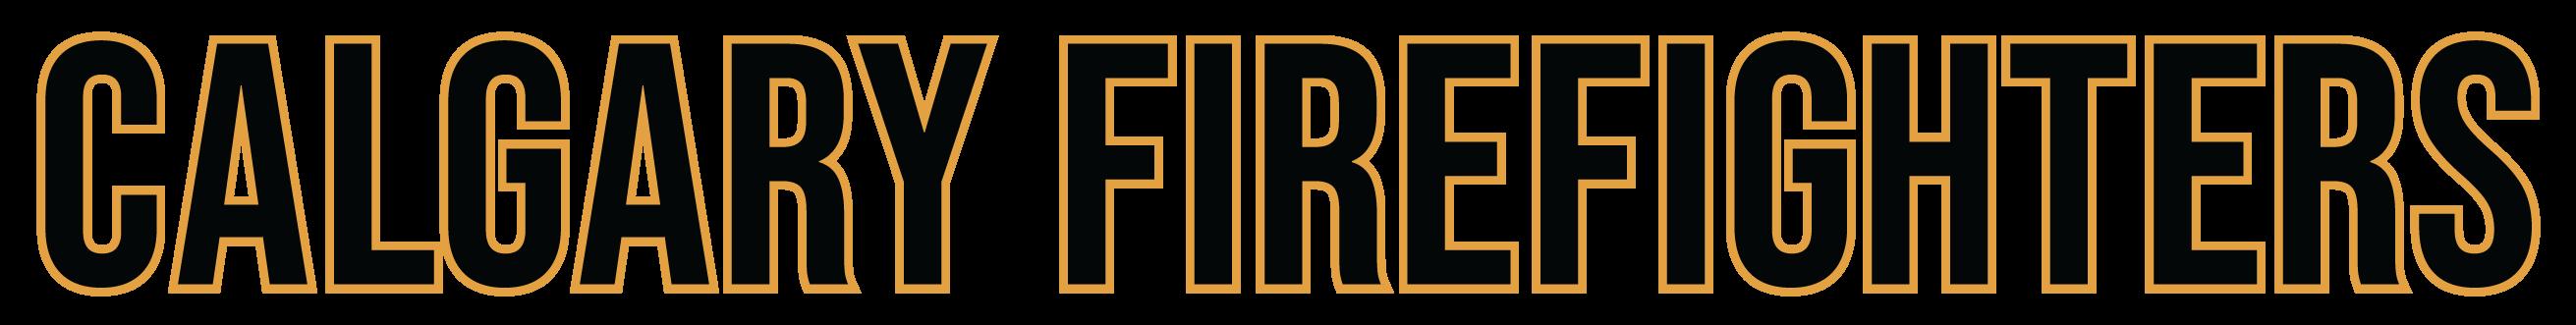 Calgary Firefighters